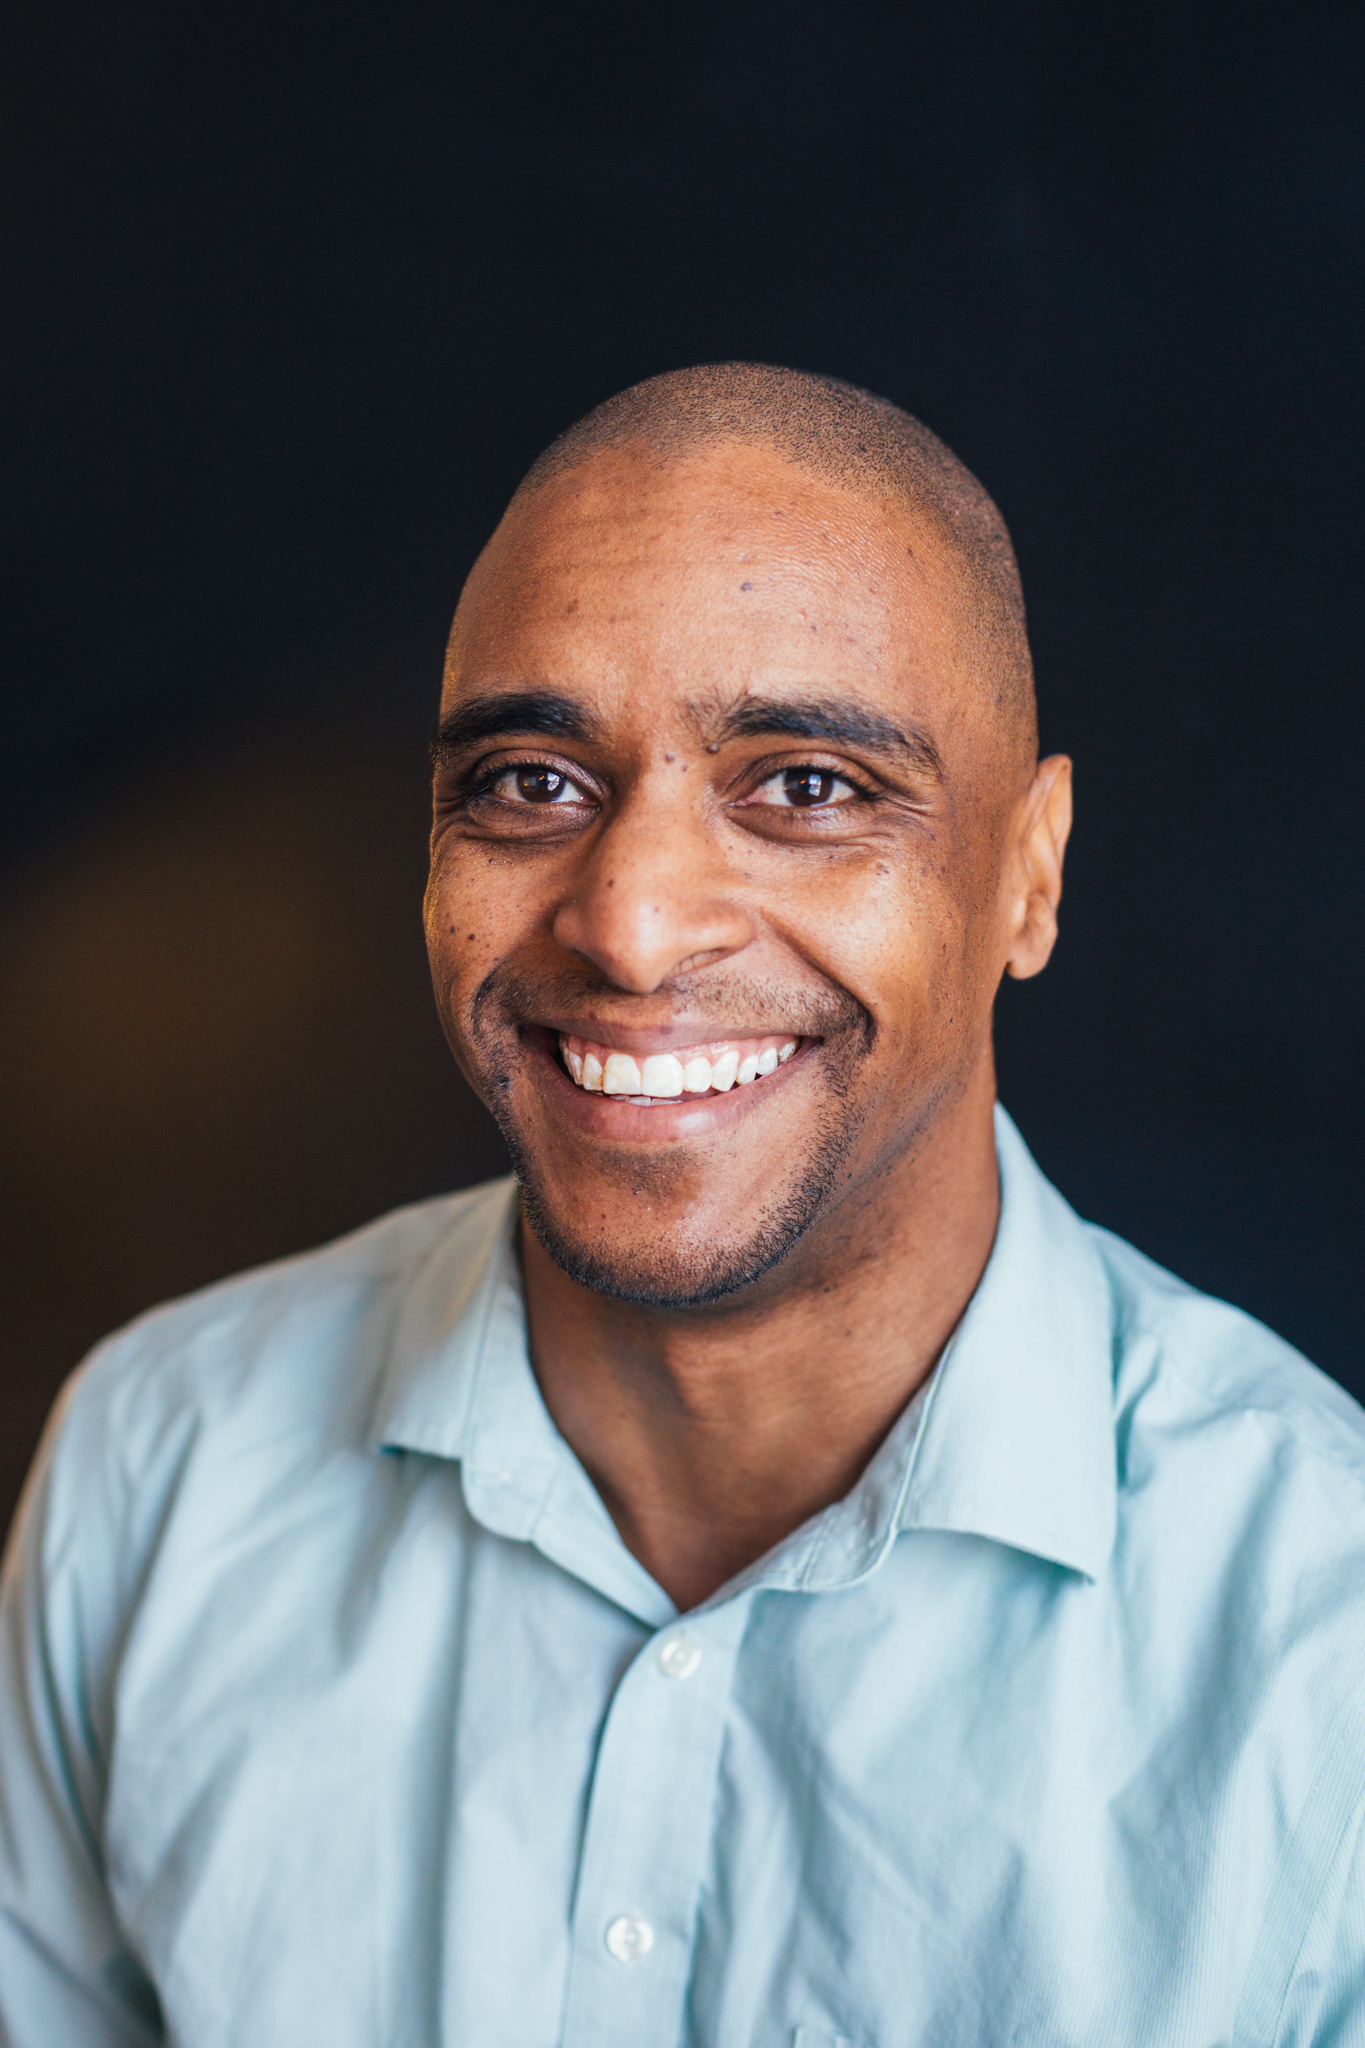 Micah Evans - SPIRITUAL FORMATION PASTORmicah@crossroadschurchaustin.comBio